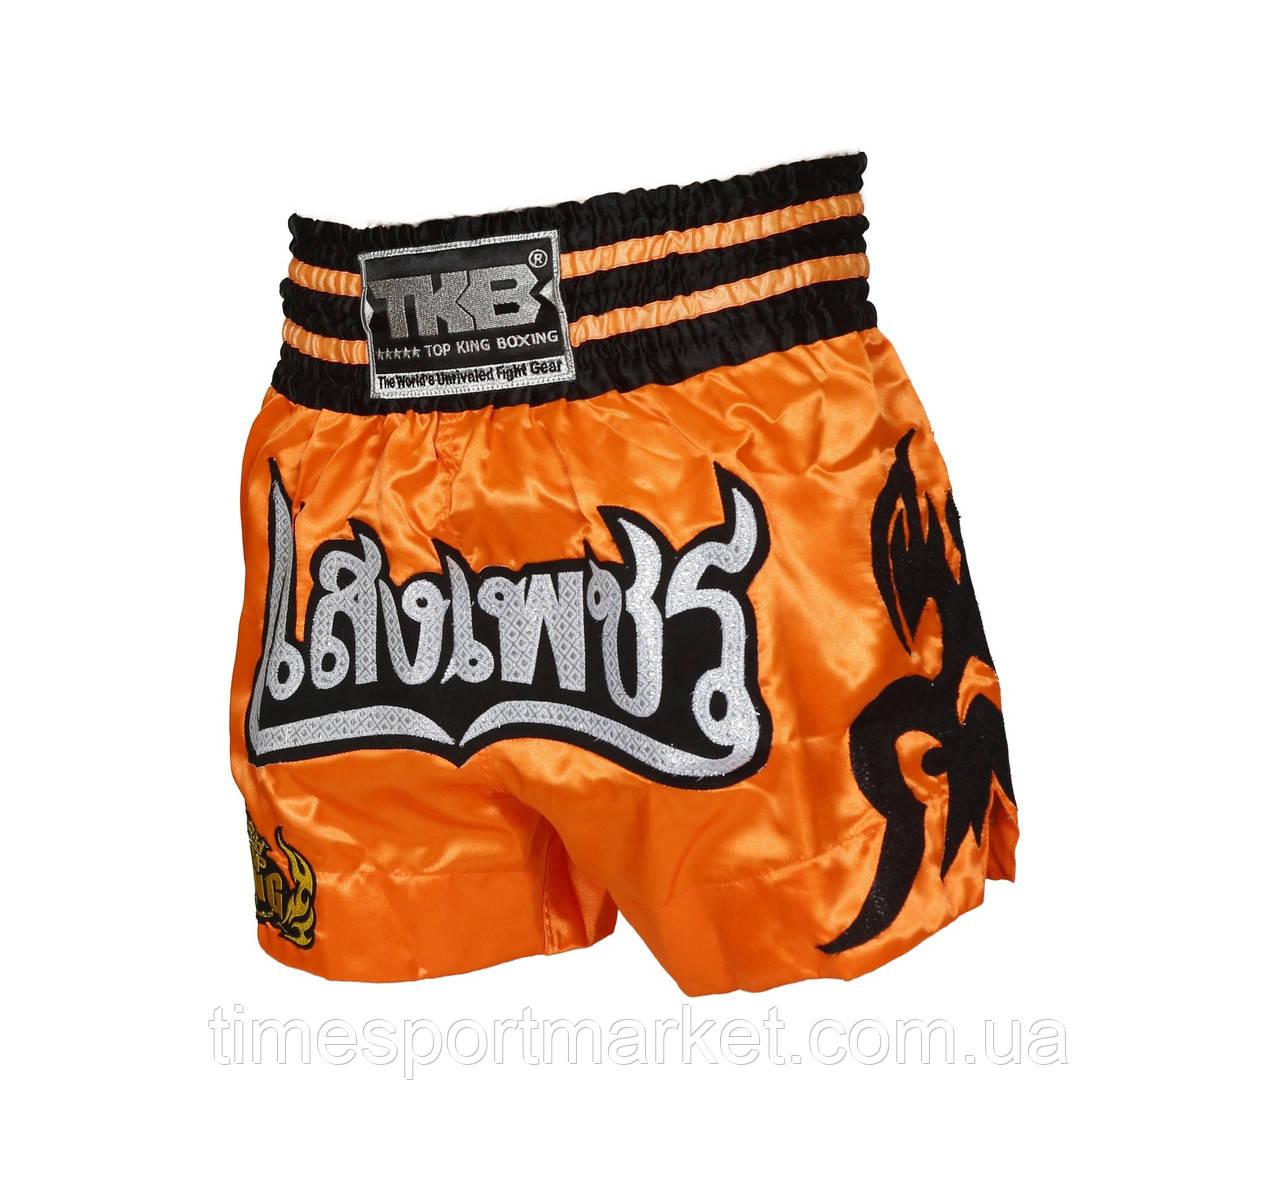 ШОРТЫ TOP KING MUAY THAI BOXING SHORTS - TATTOO ORANGE